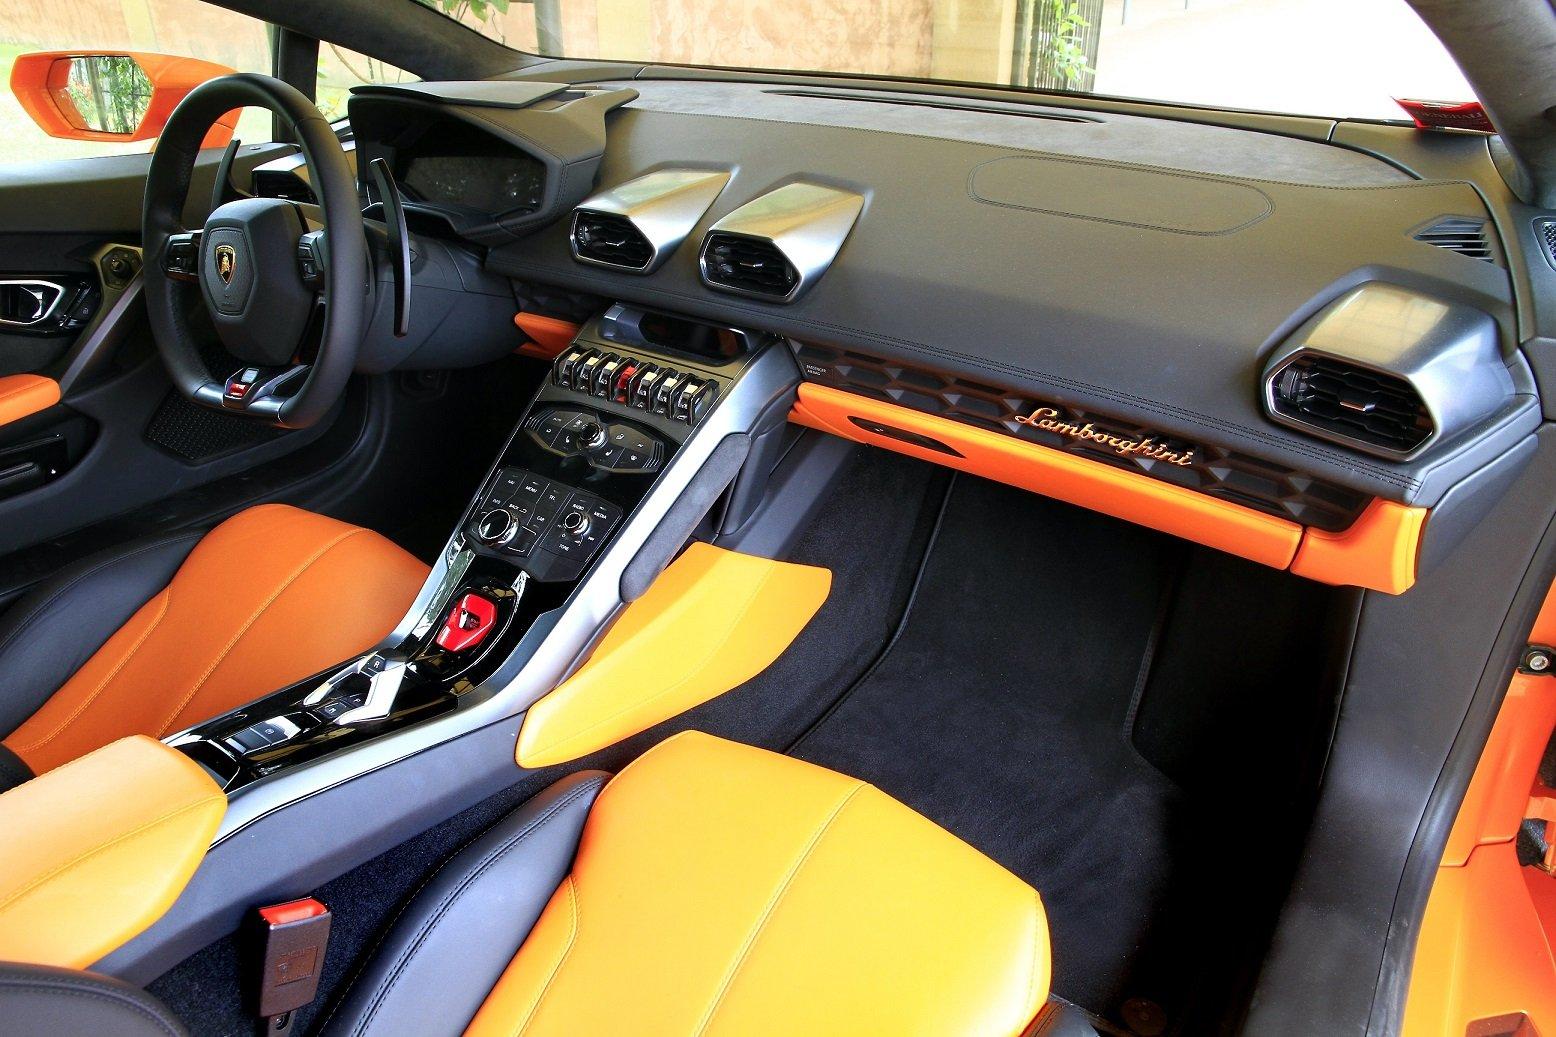 2014 610 4 huracan lamborghini lb724 orange supercar wallpaper 1556x1037 390006 wallpaperup - Lamborghini Huracan Orange Interior